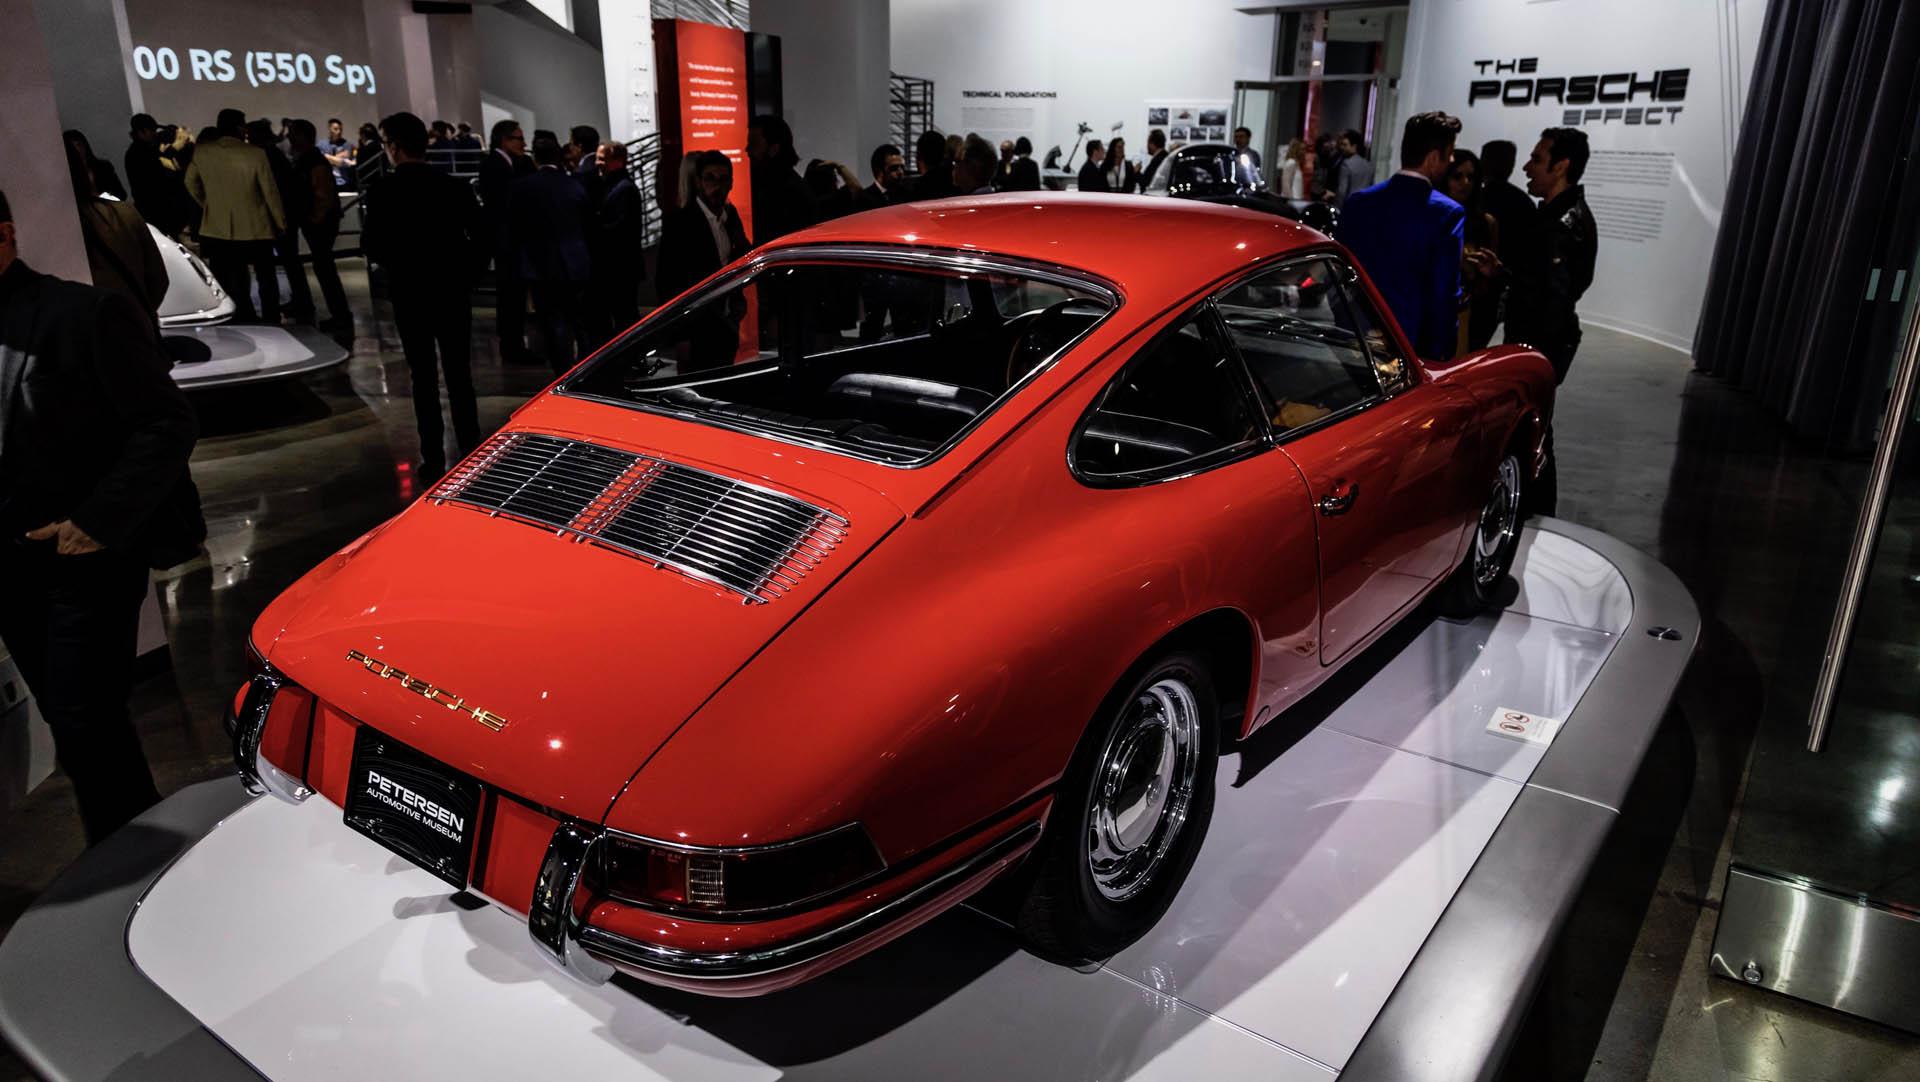 The Porsche Effect (3)